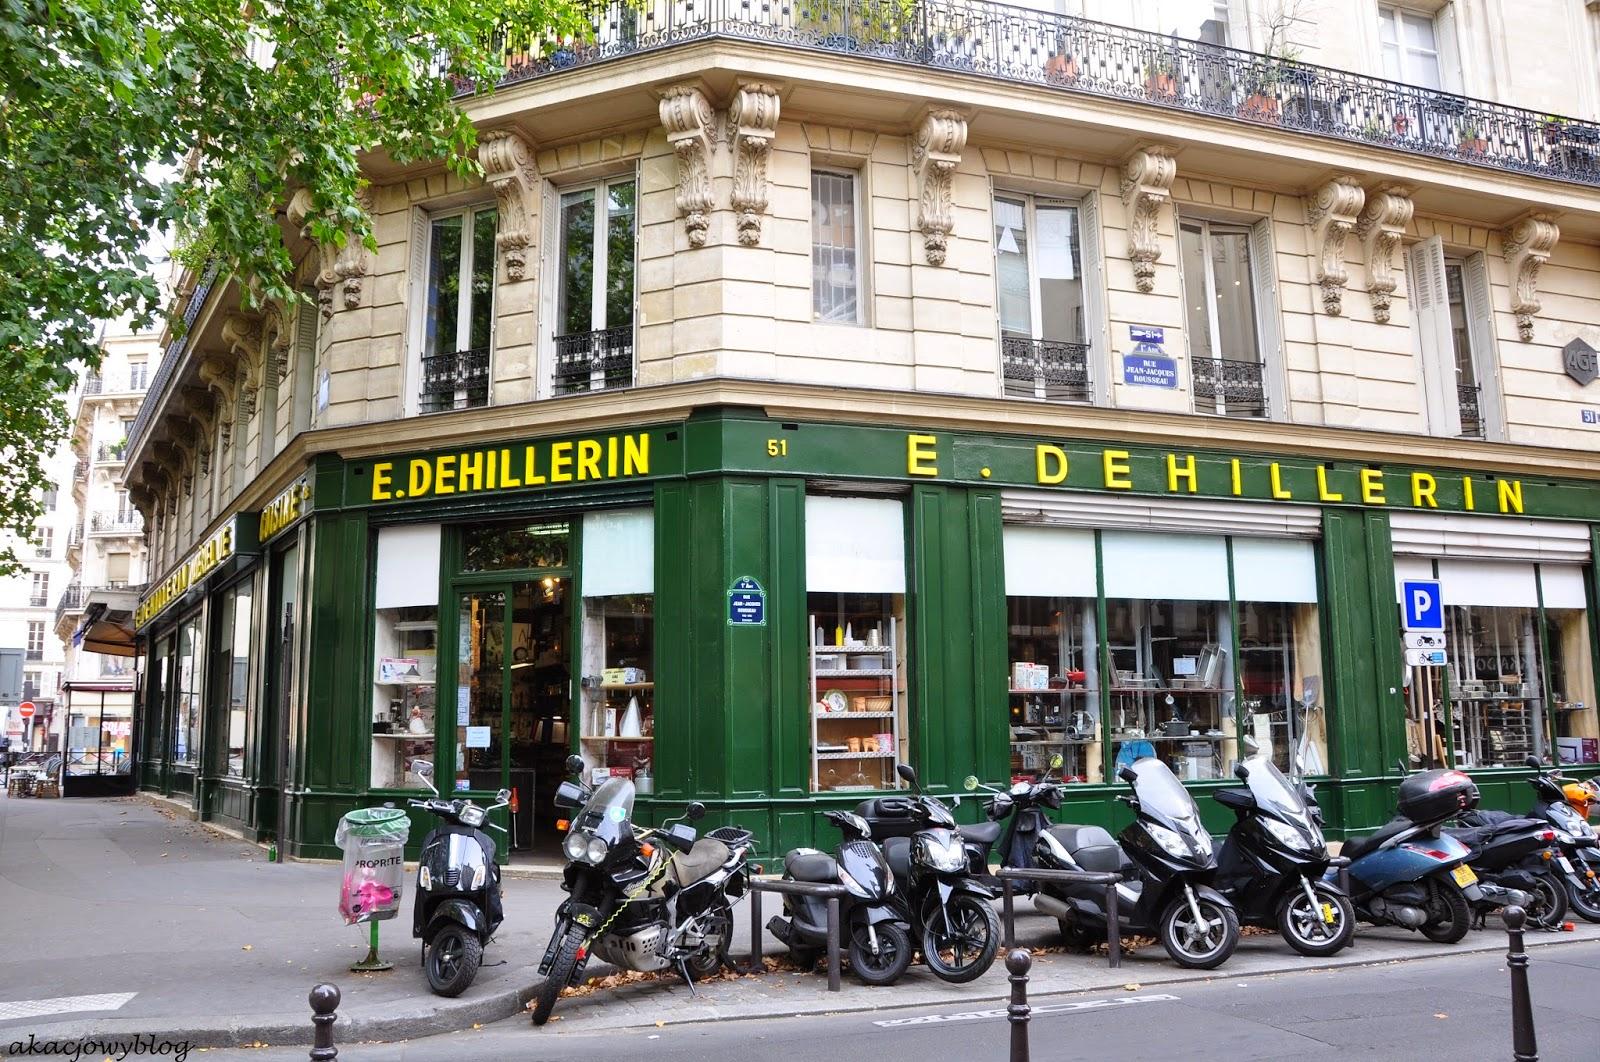 Paryż - w sklepie E. Dehillerin.